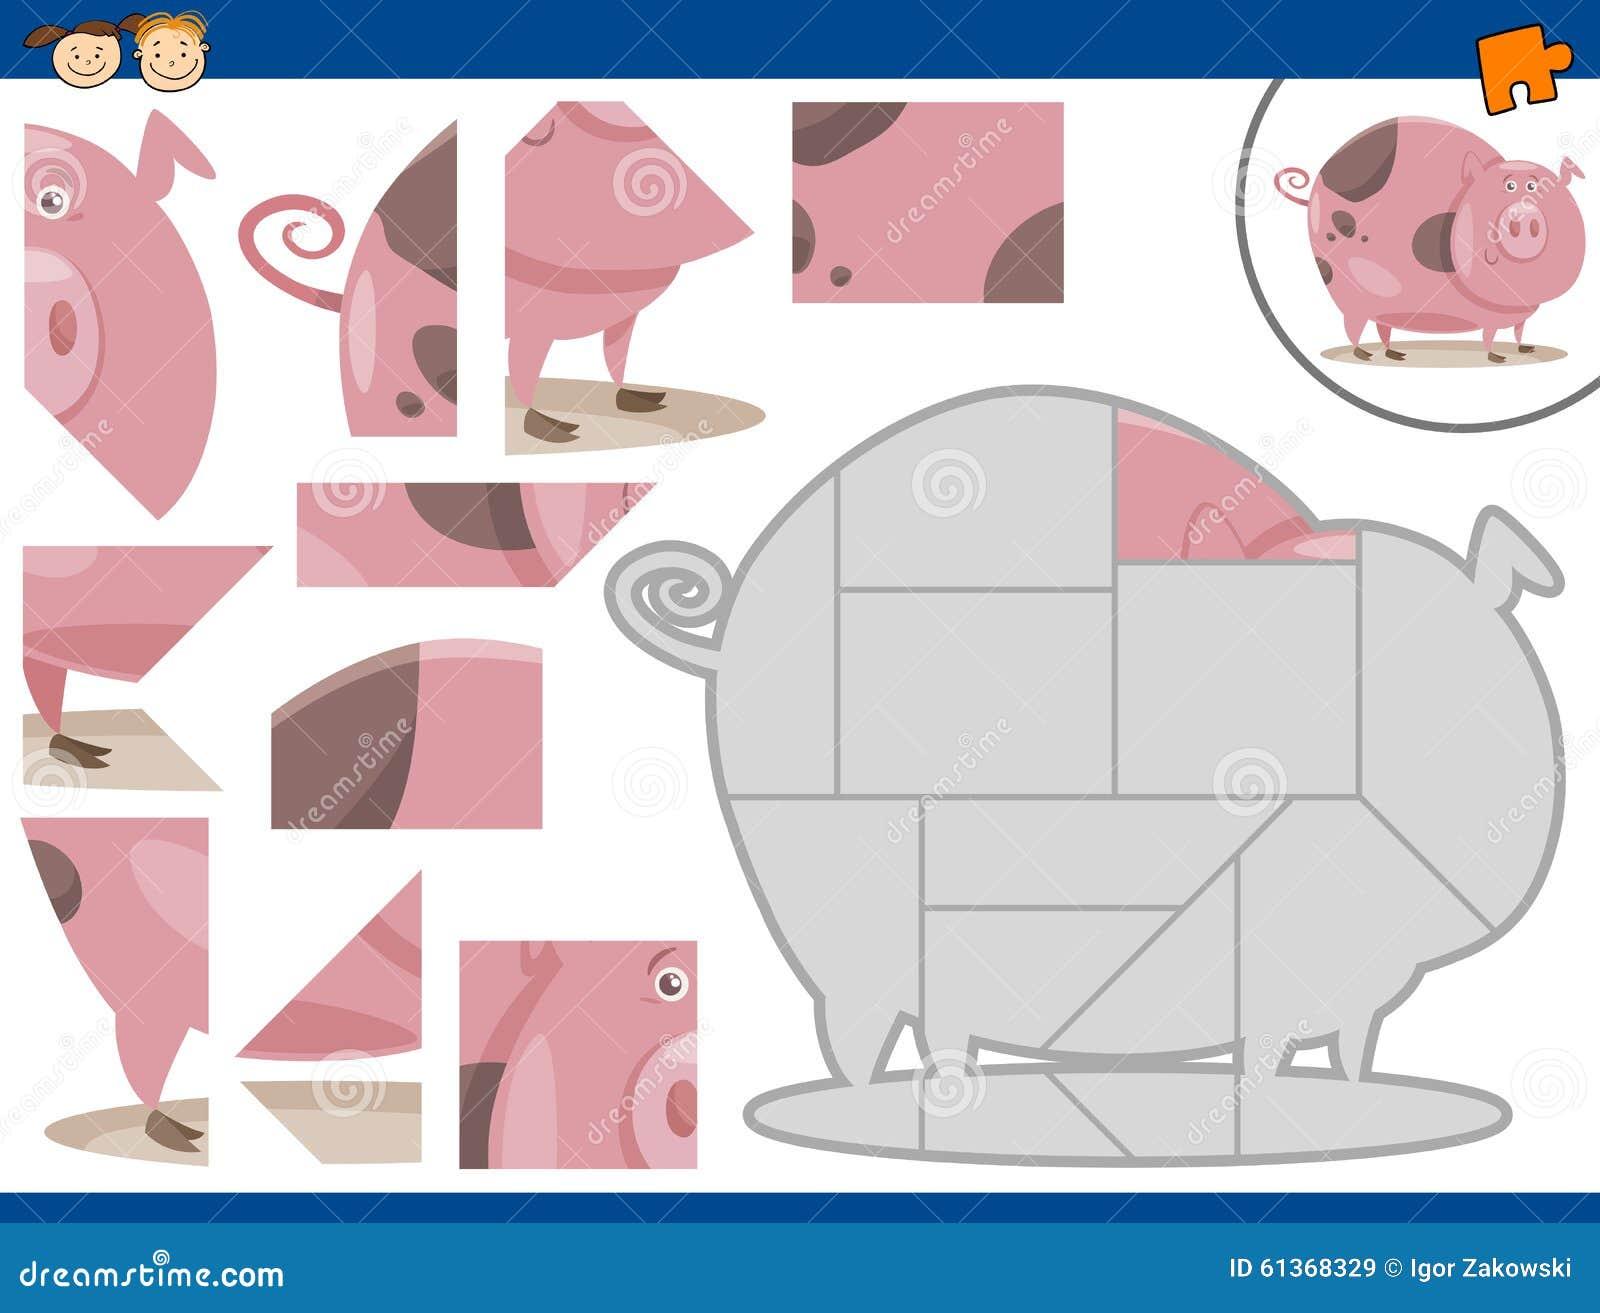 cartoon pig jigsaw puzzle task stock vector image 61368329 sheep brain diagram